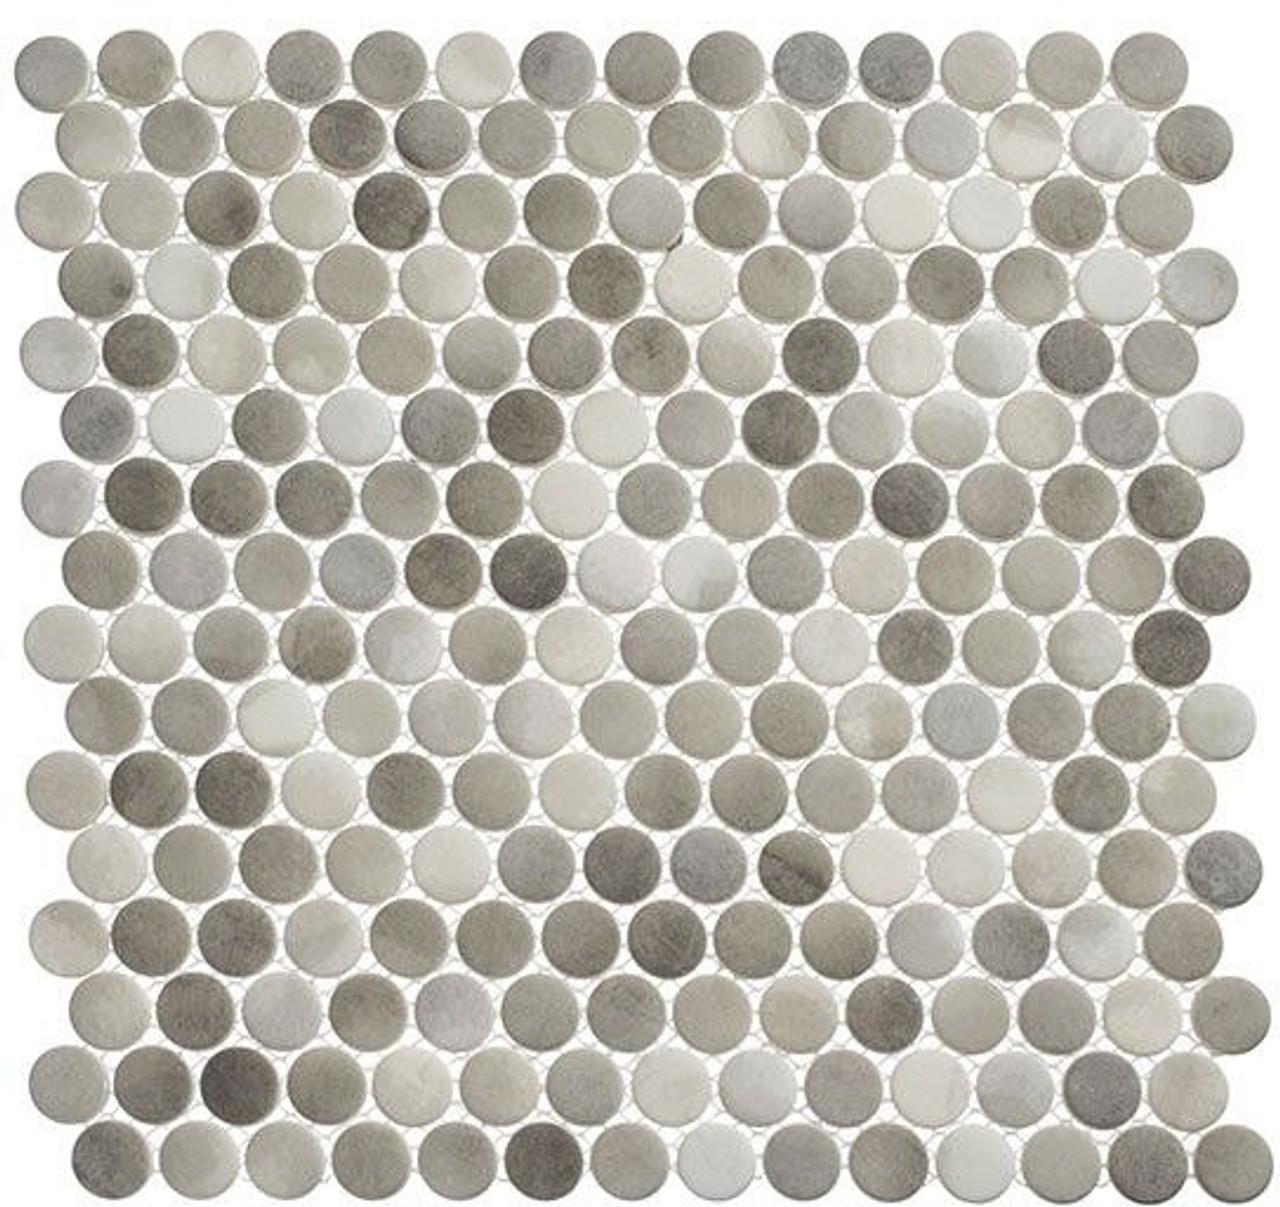 Bella Glass Tiles Polka Dots PLK64 Enlightened Sky